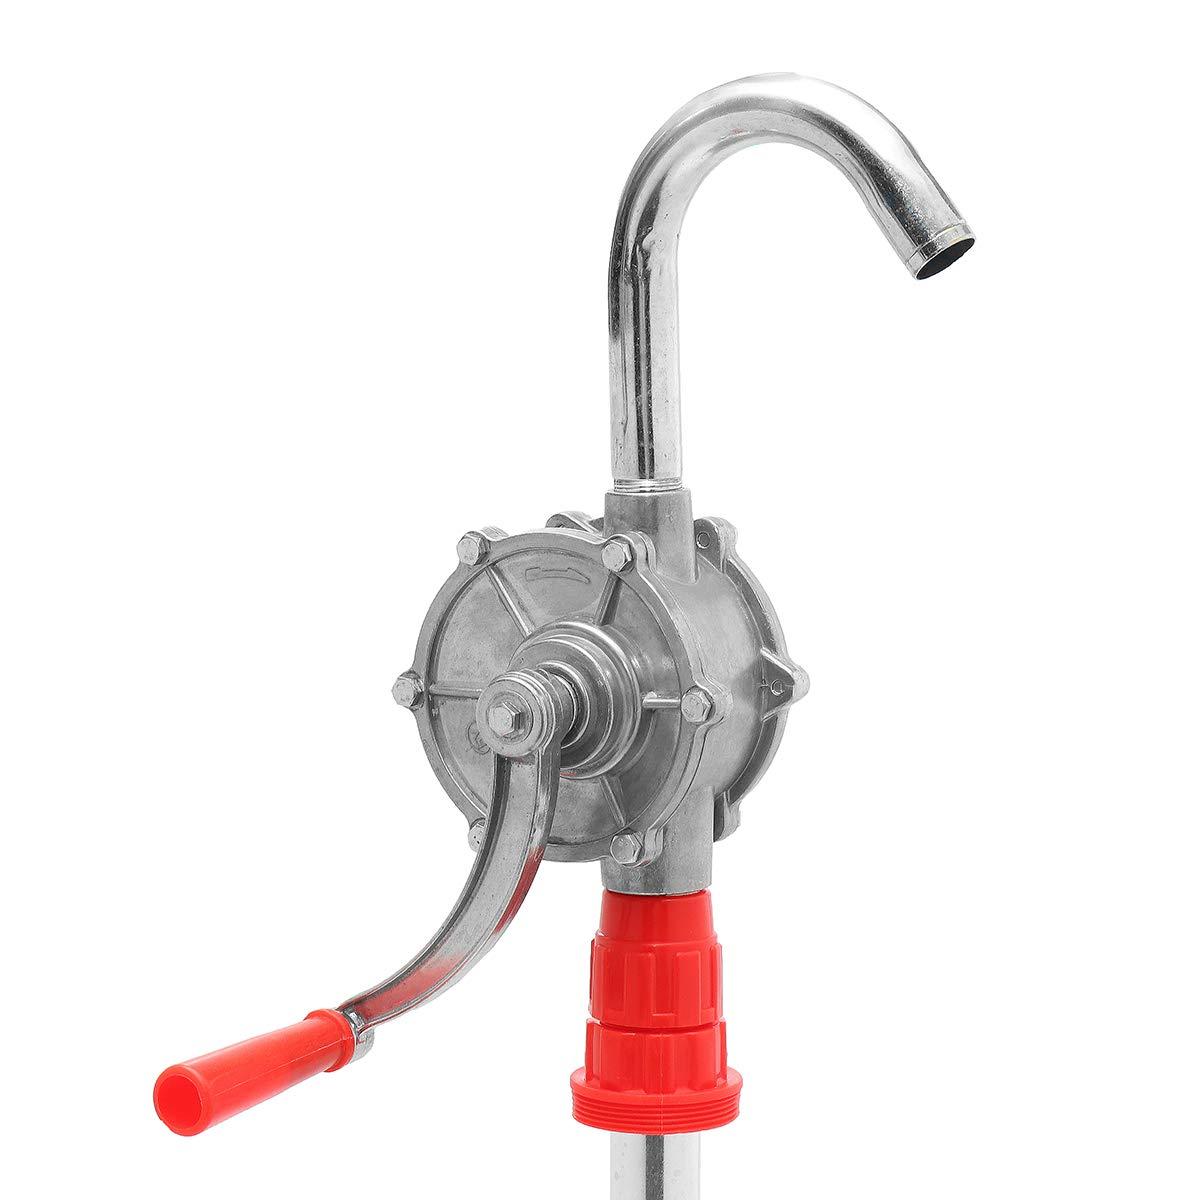 RanDal Bomba Manual Giratoria De Tambor Para Trabajo Pesado 22L / Min Nuevo Barril De Combustible De Aceite